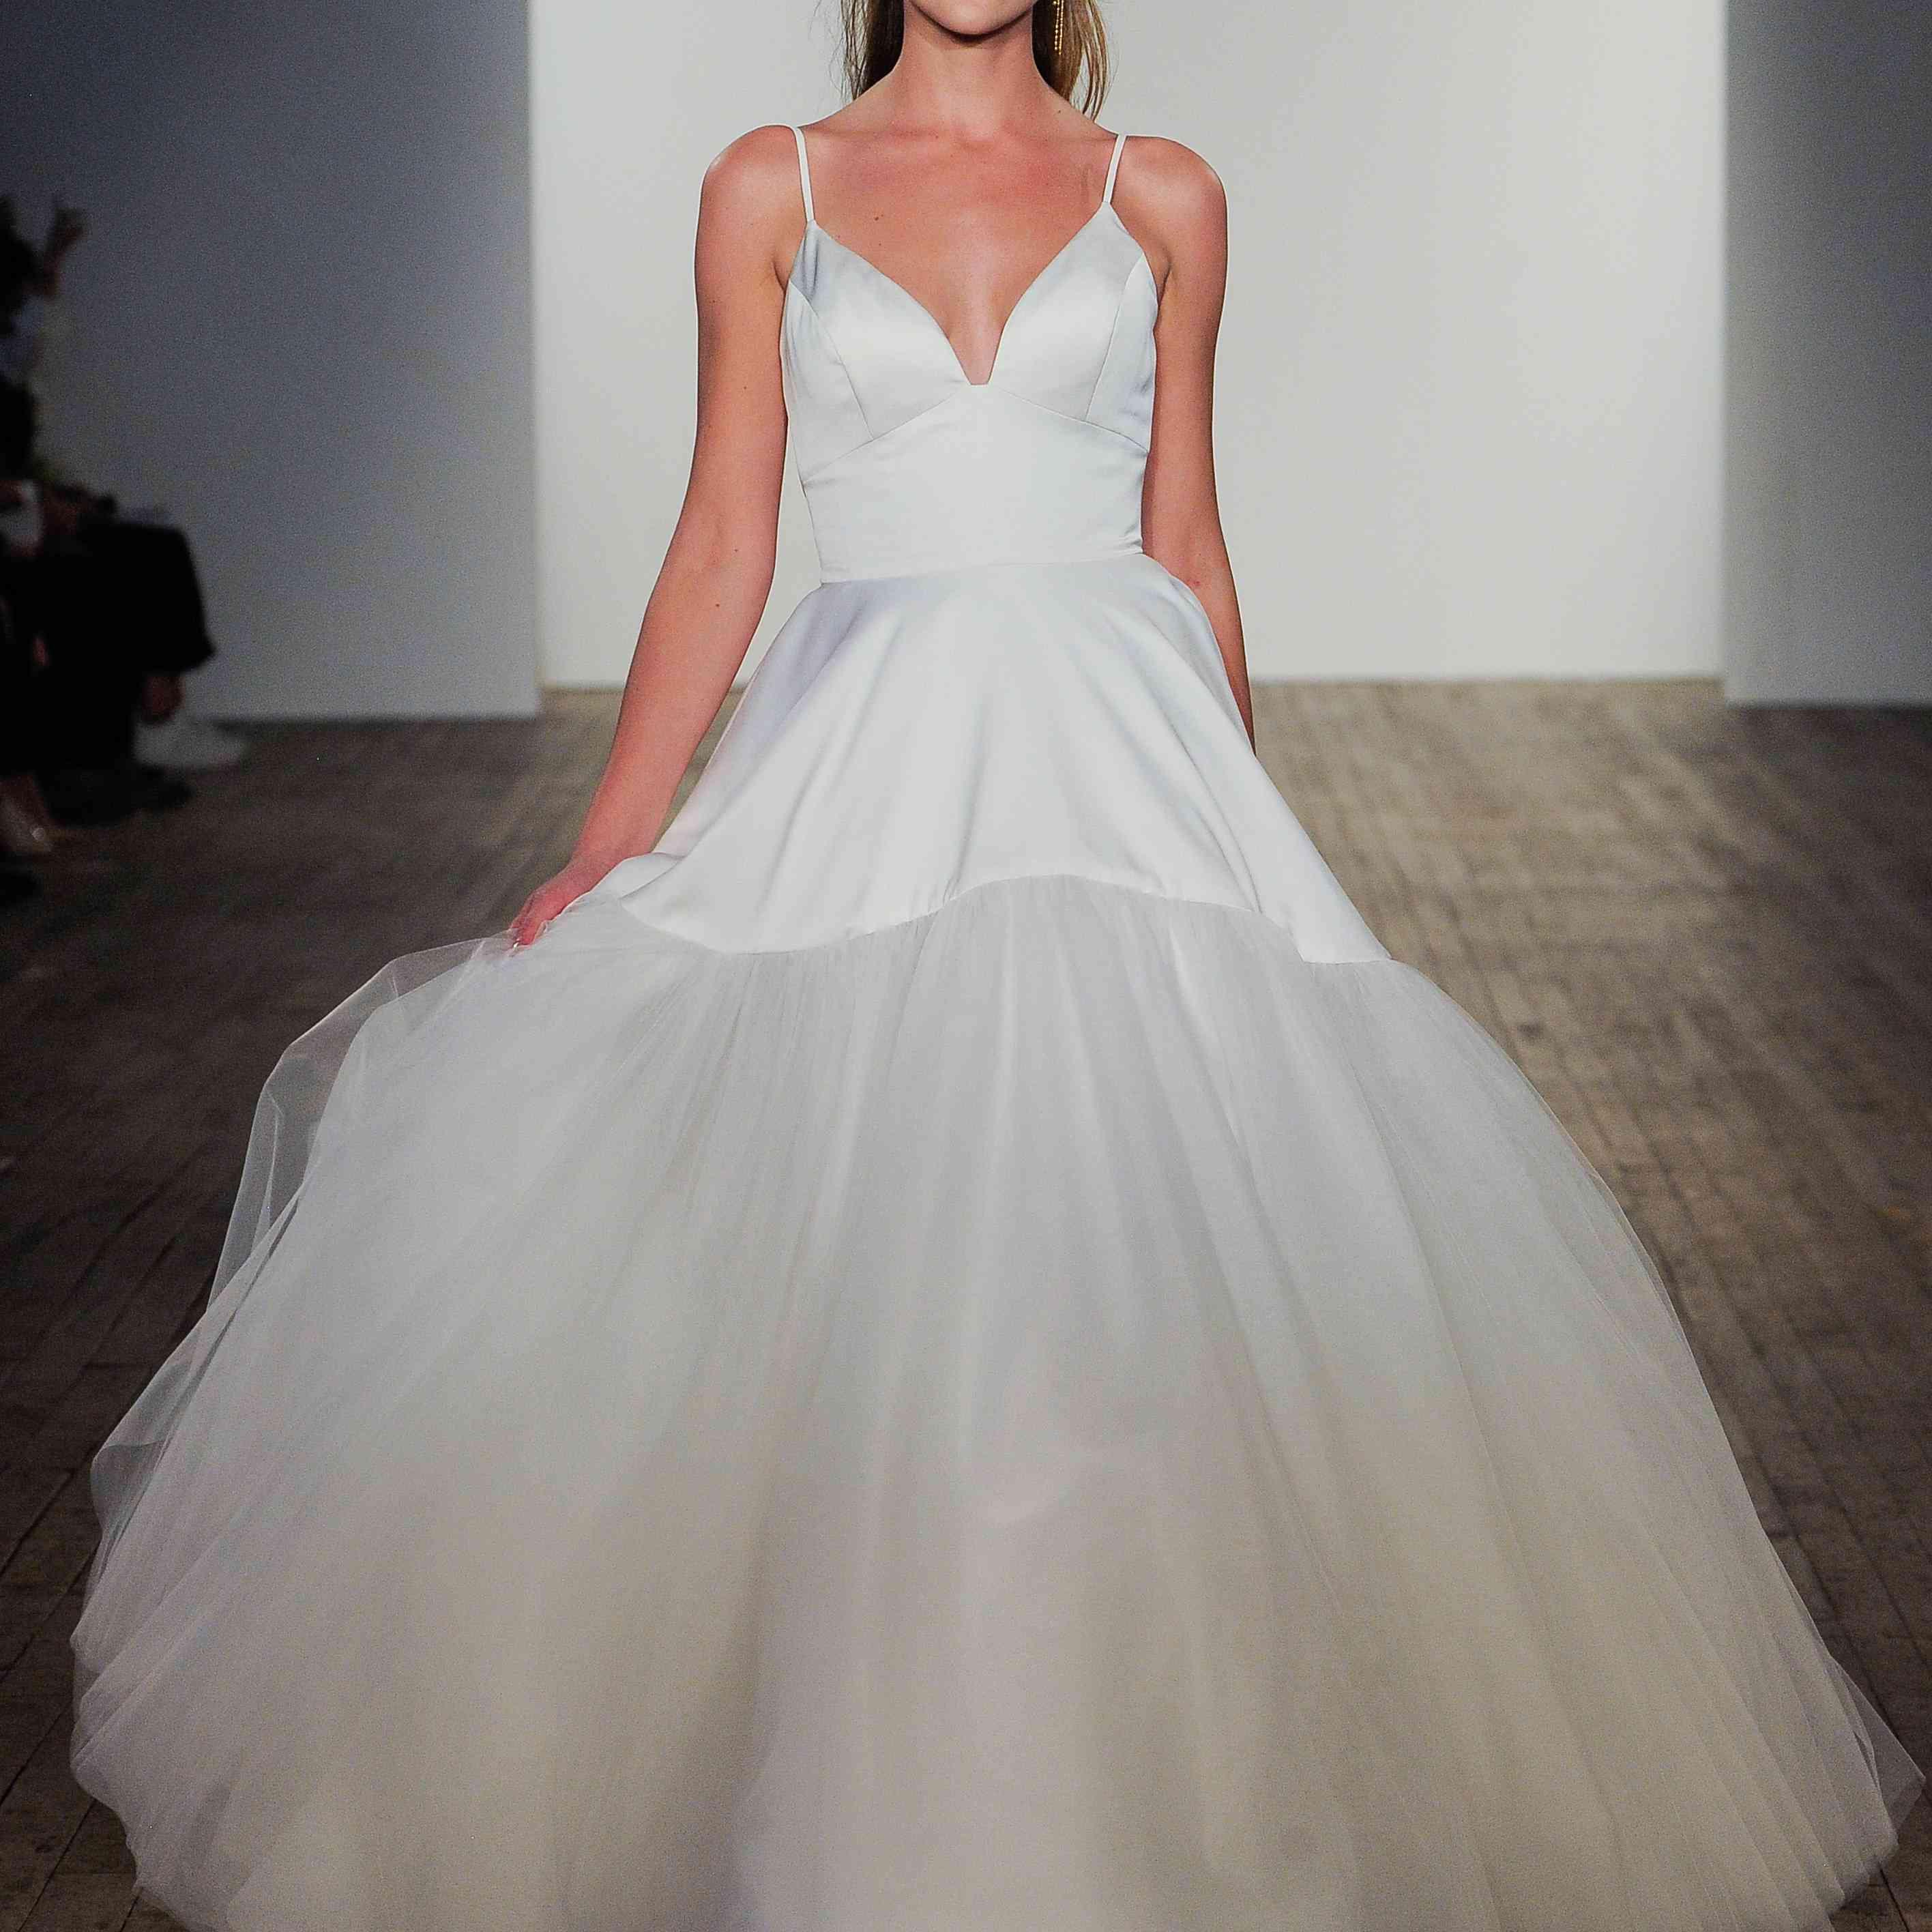 Rhode Blush by Hayley Paige Wedding Dress